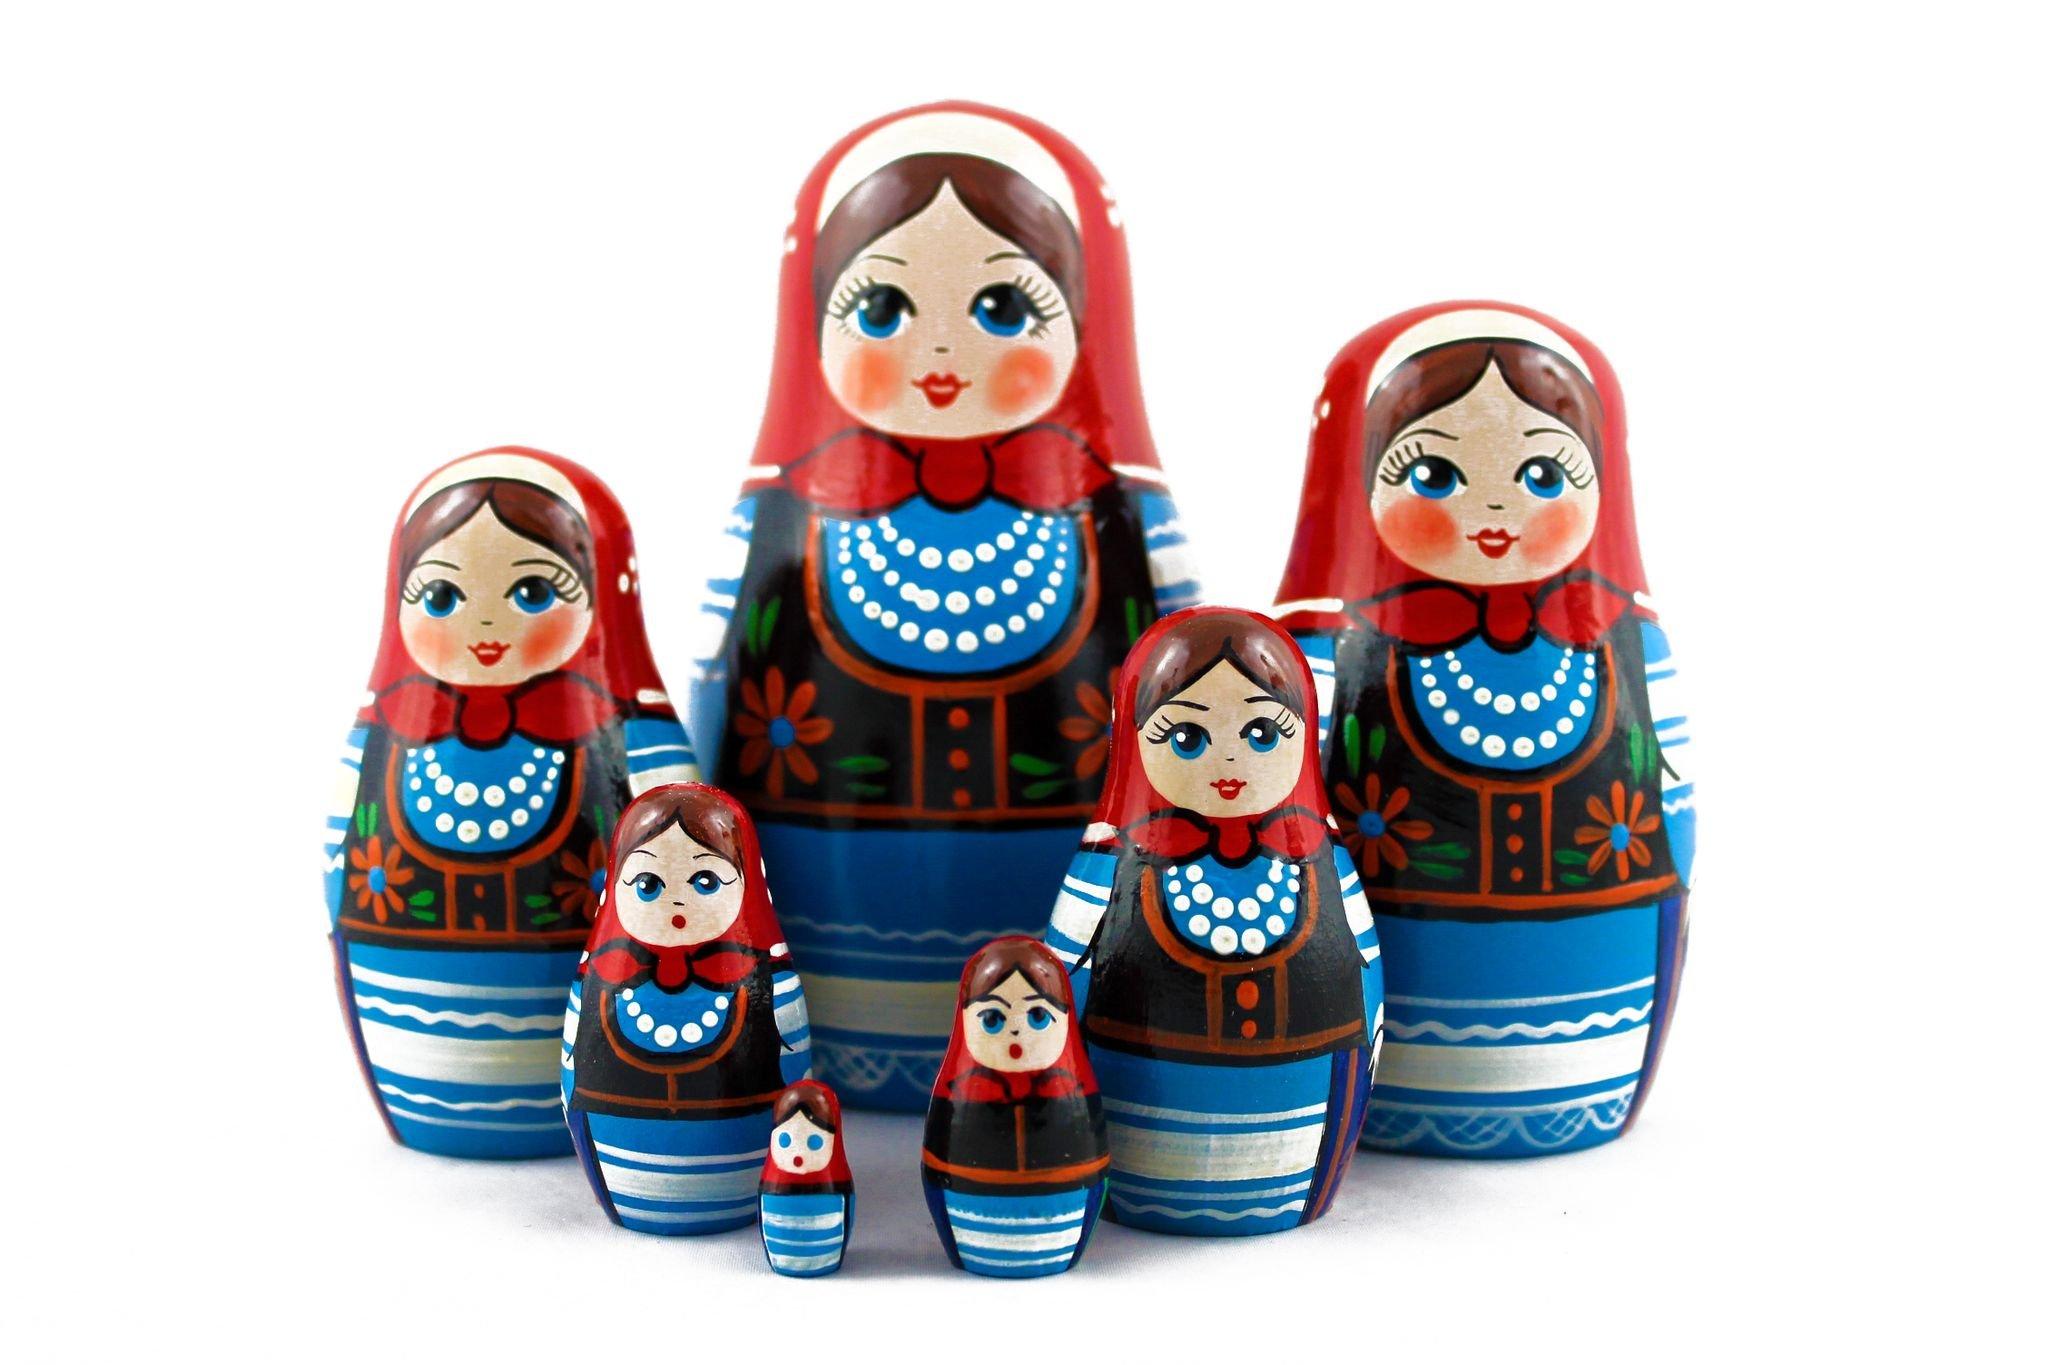 Matryoshka Polish National Dress Babushka Russian Nesting Wooden Stacking Doll 7 Pcs by MATRYOSHKA&HANDICRAFT (Image #6)